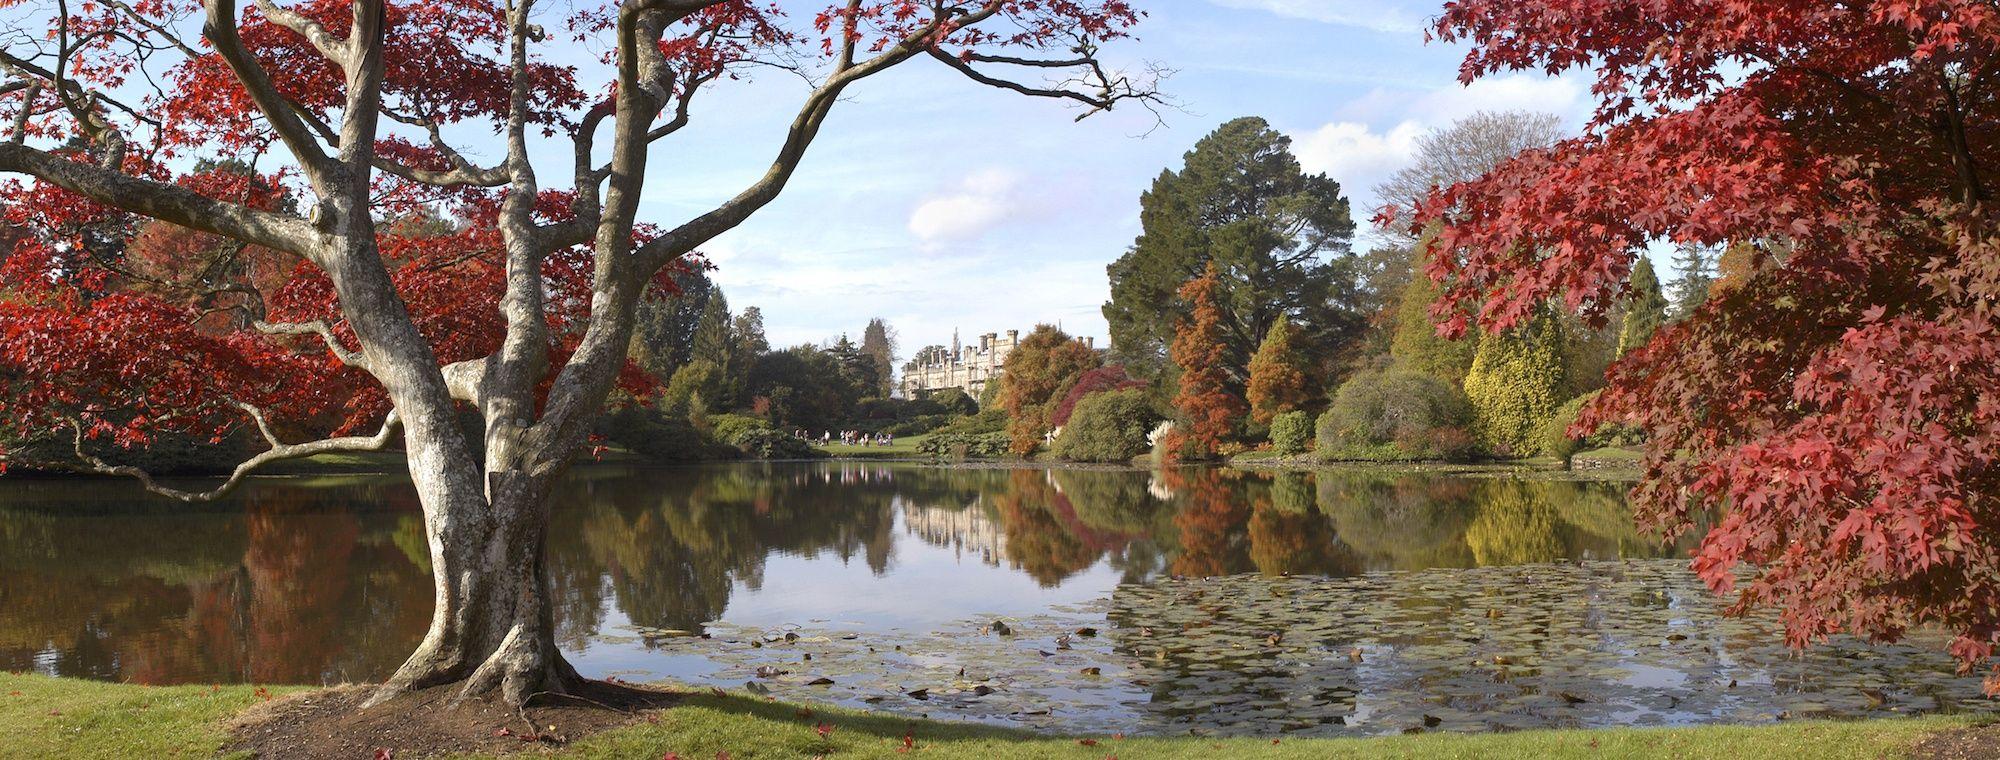 iStock-186836668-Sheffield-Park-and-Gardens.jpg